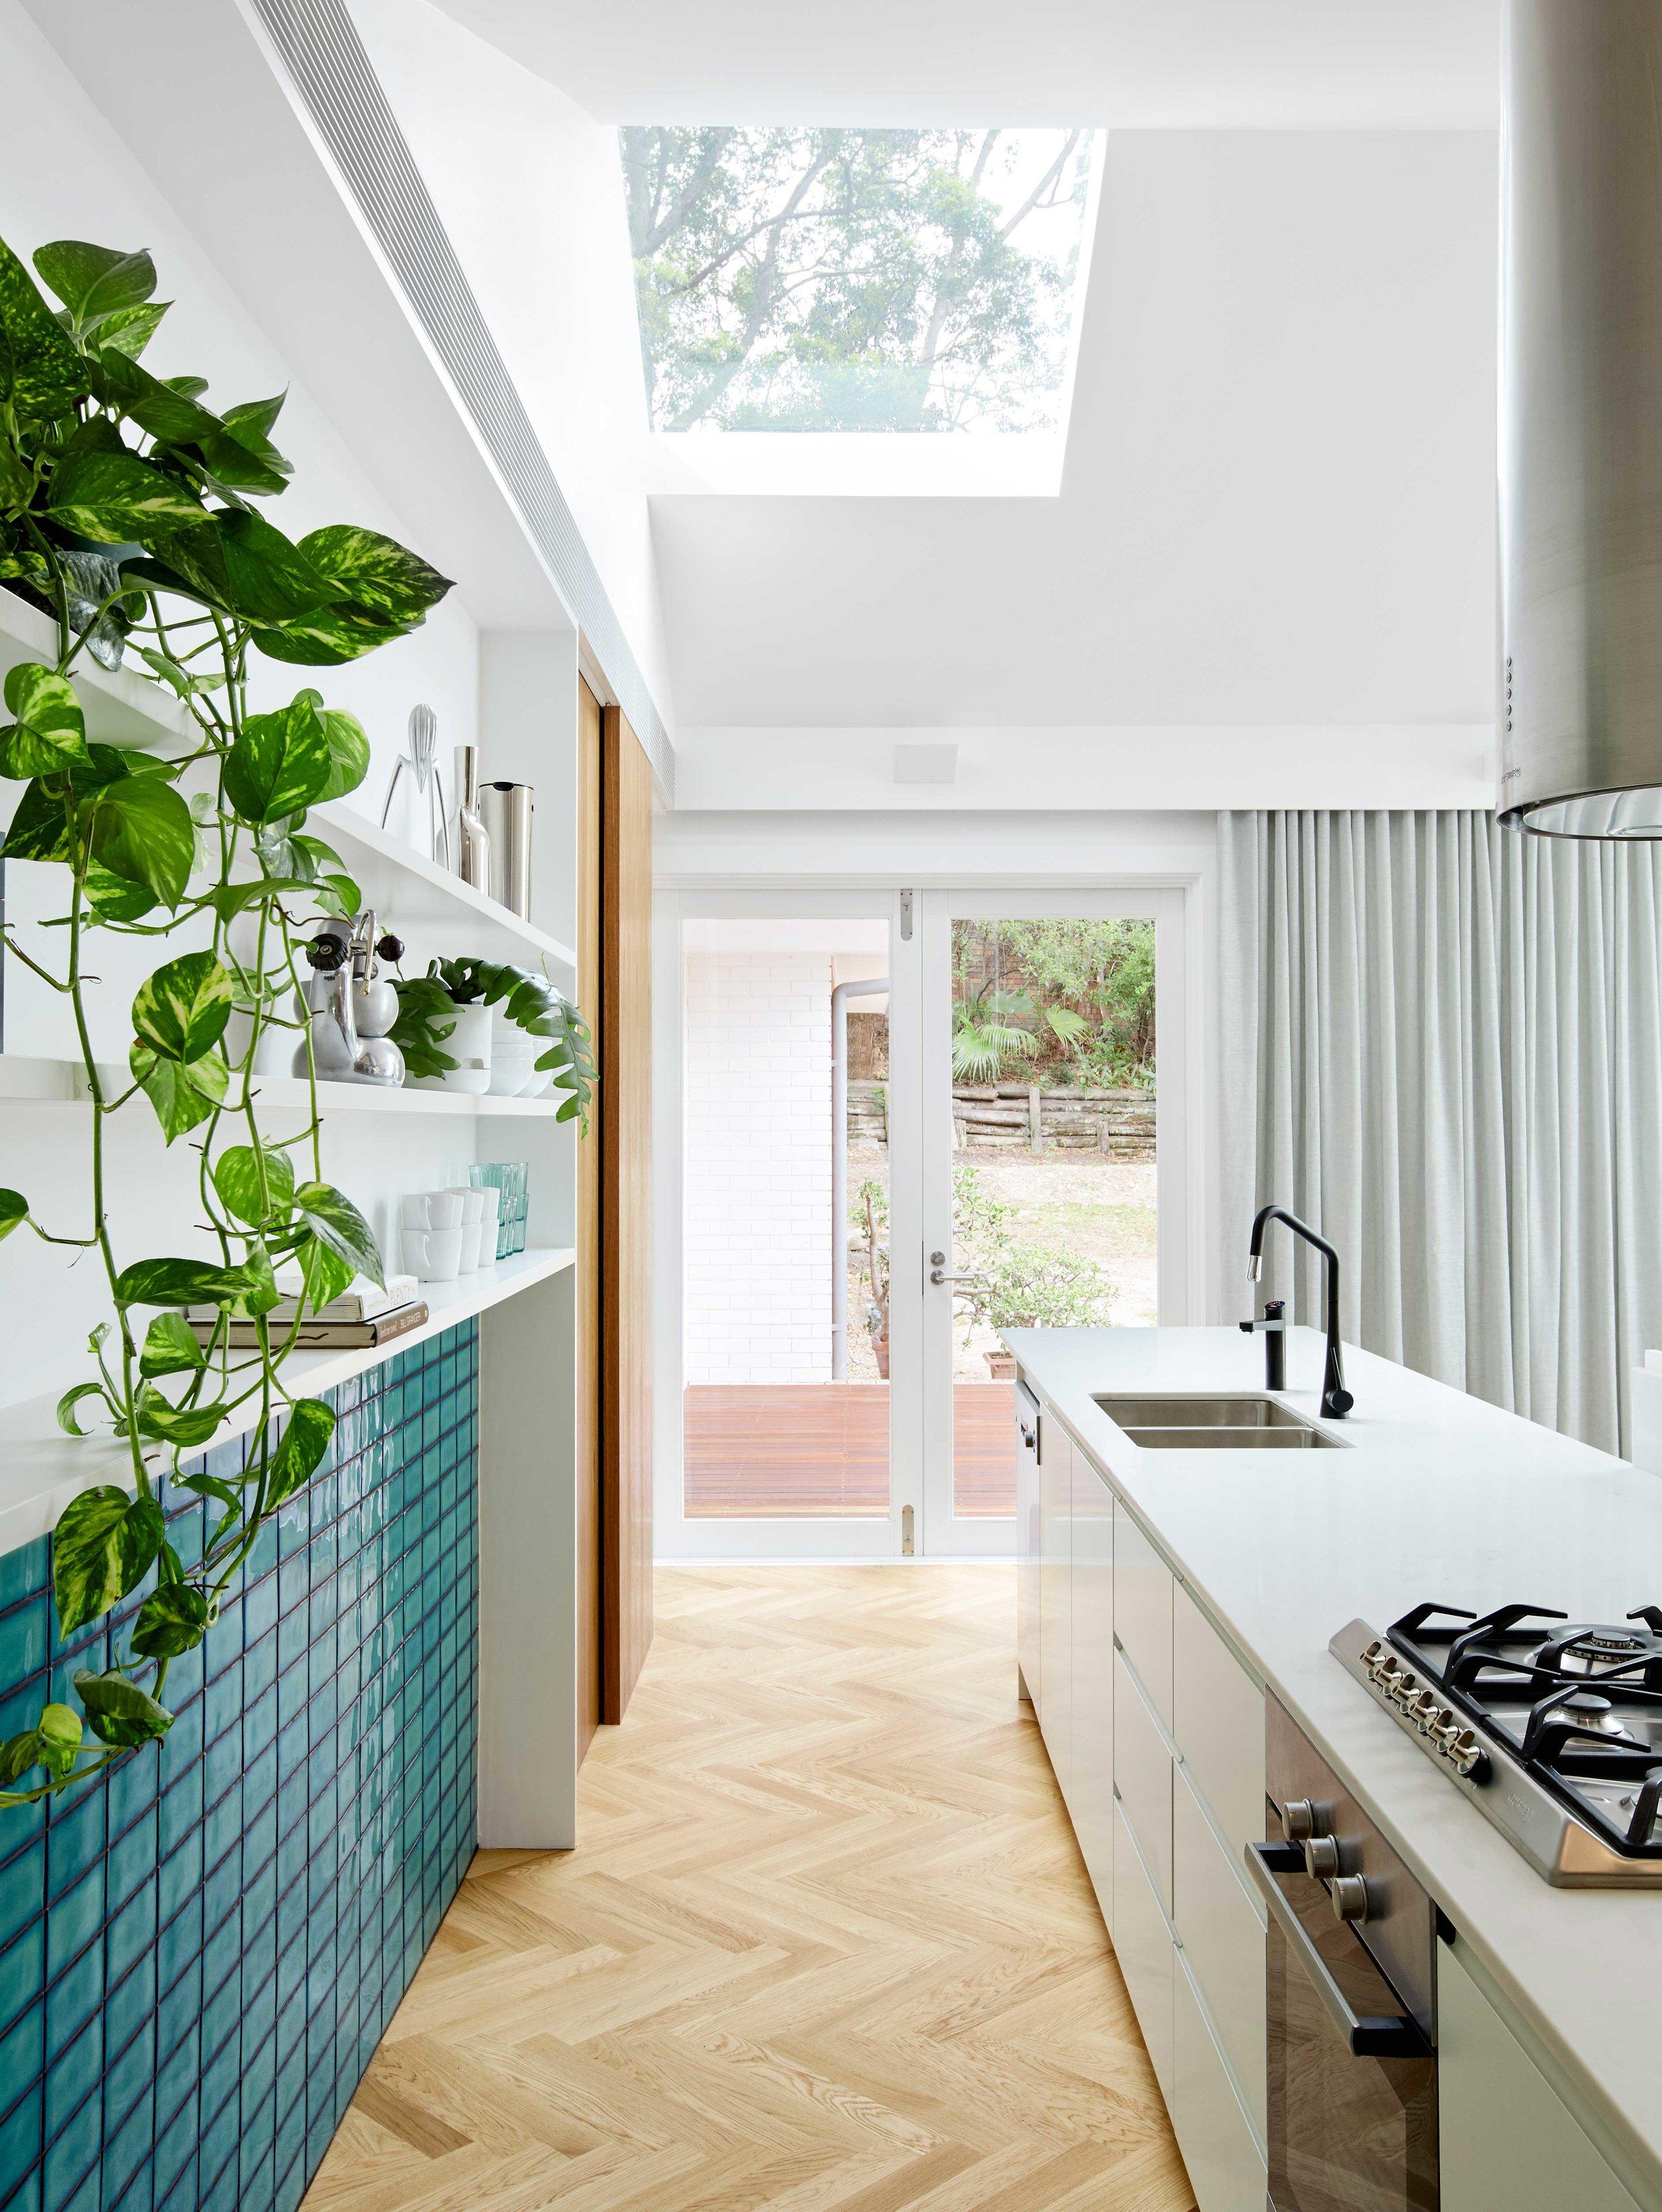 Skylit-House-14-©-Downie-North-Architects.jpg